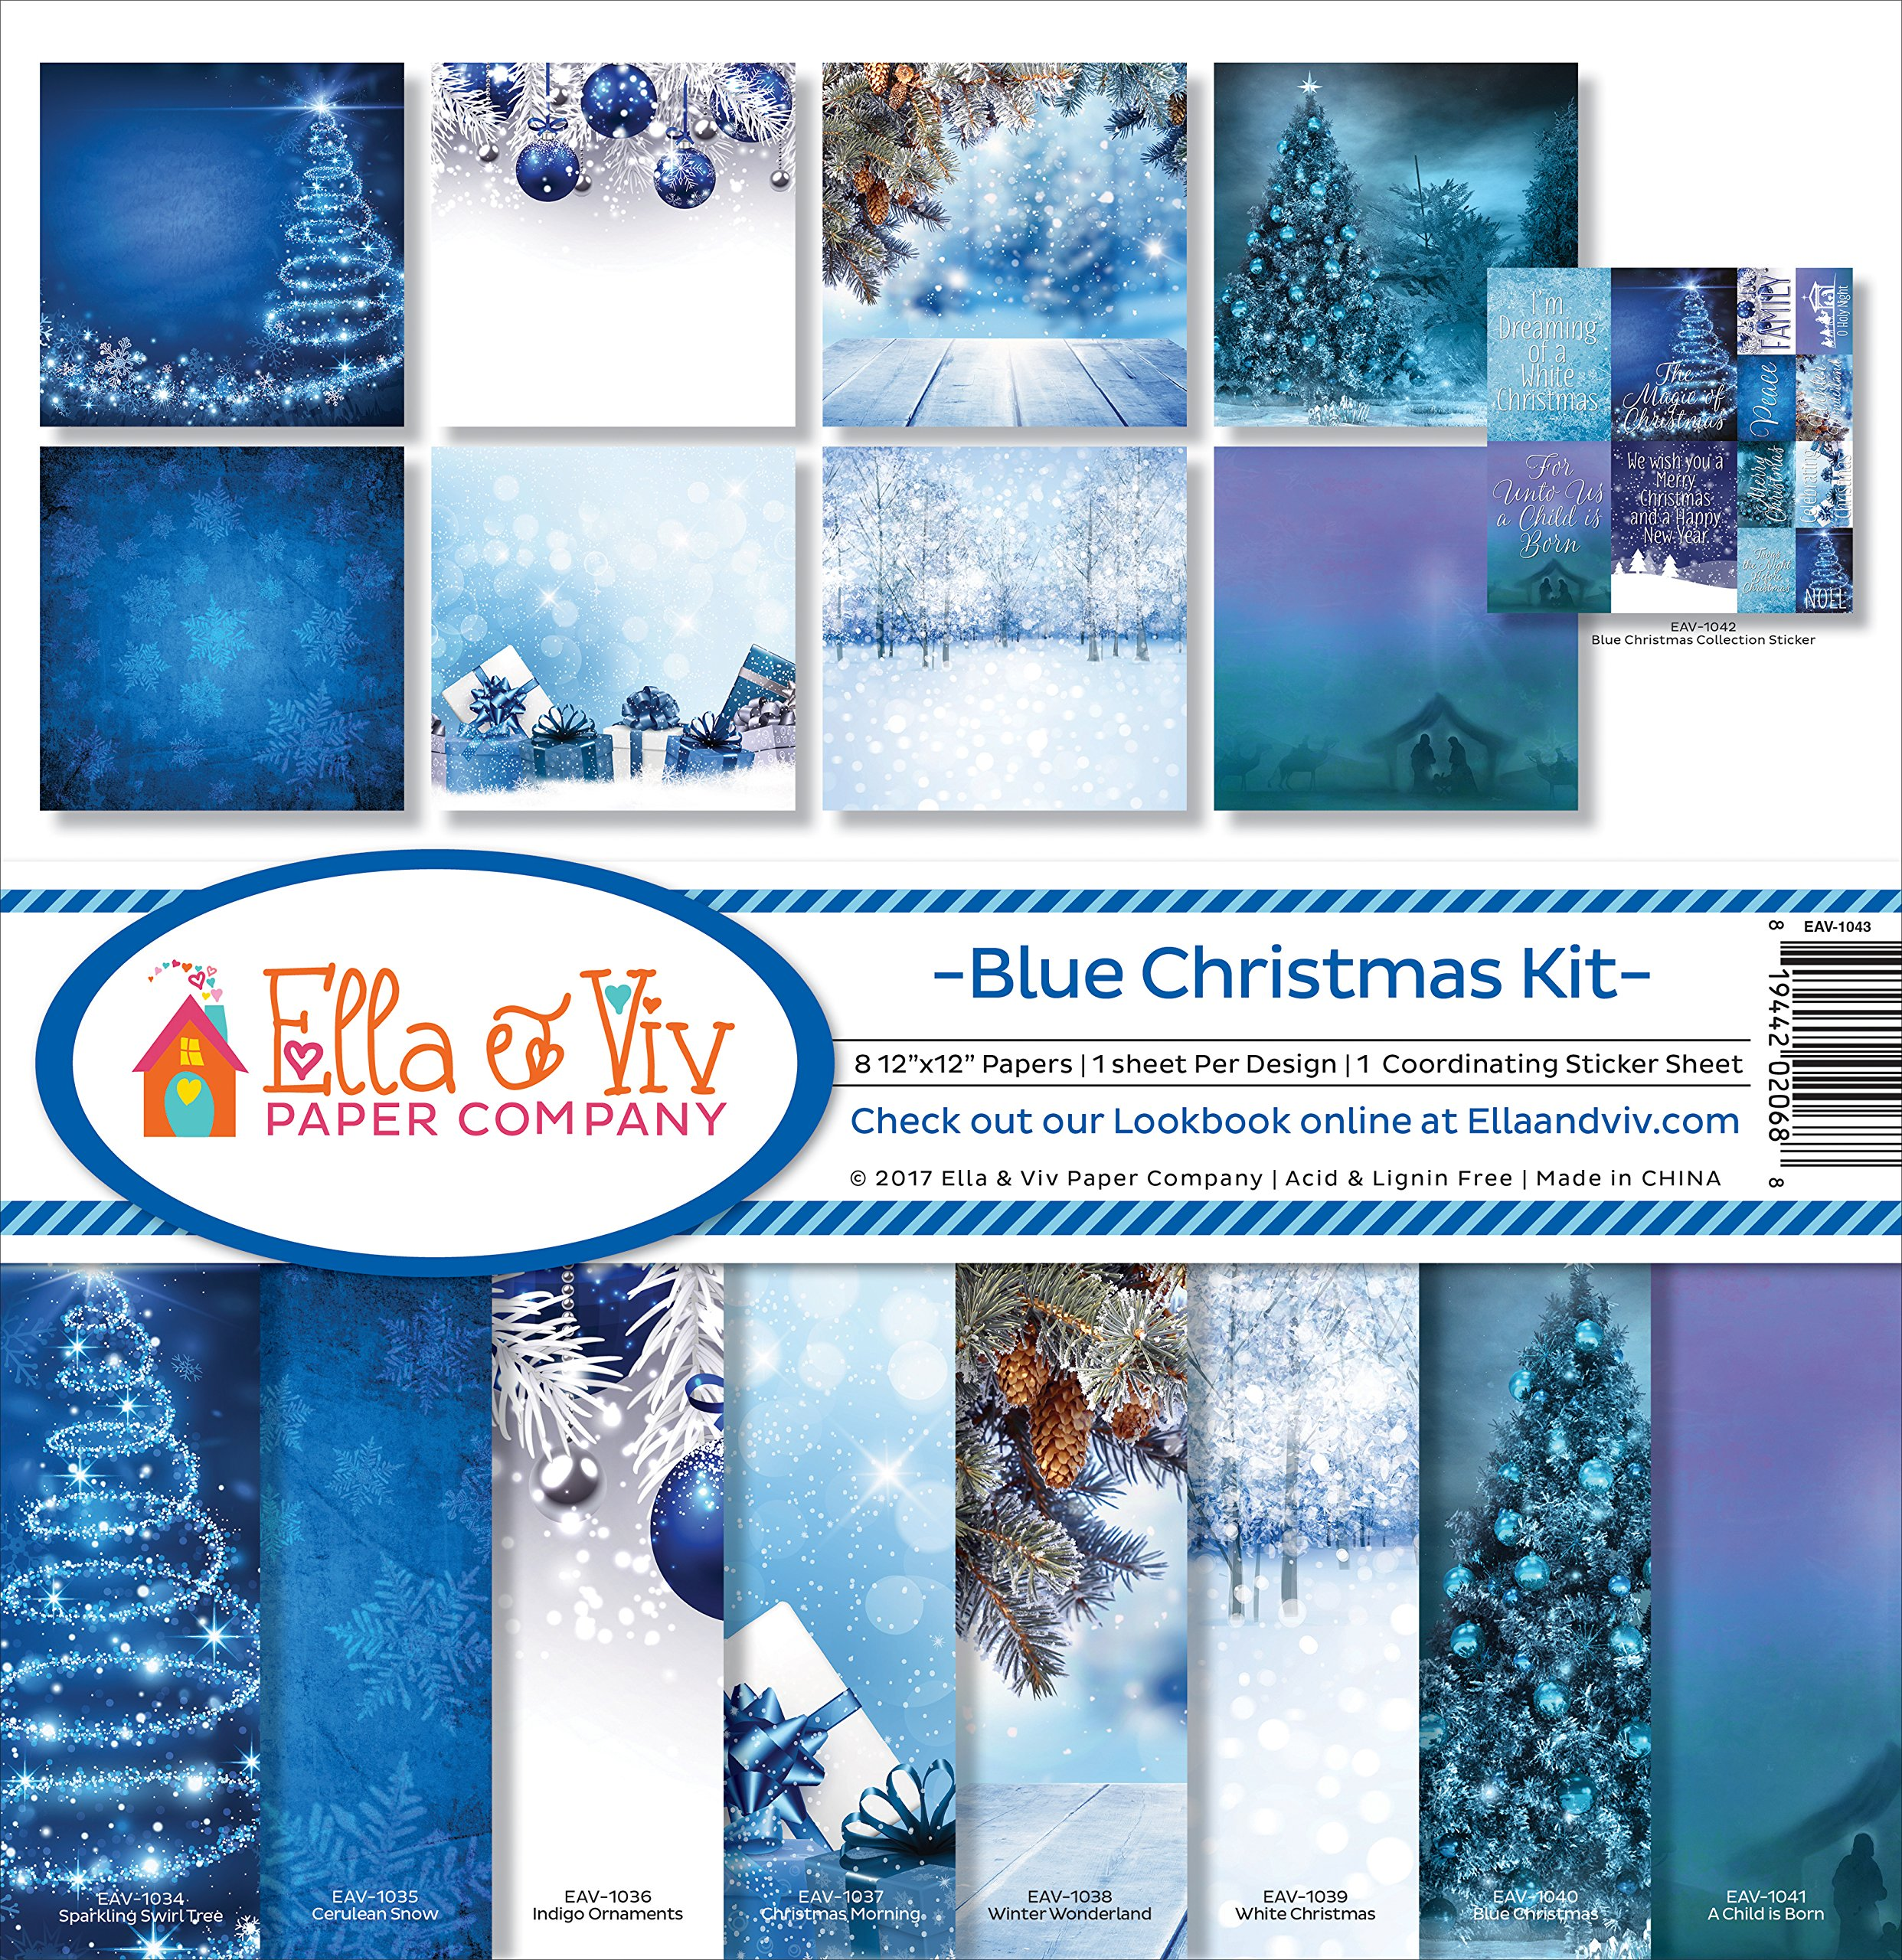 Ella & Viv by Reminisce Blue Christmas Scrapbook Collection Kit by Ella & Viv by Reminisce